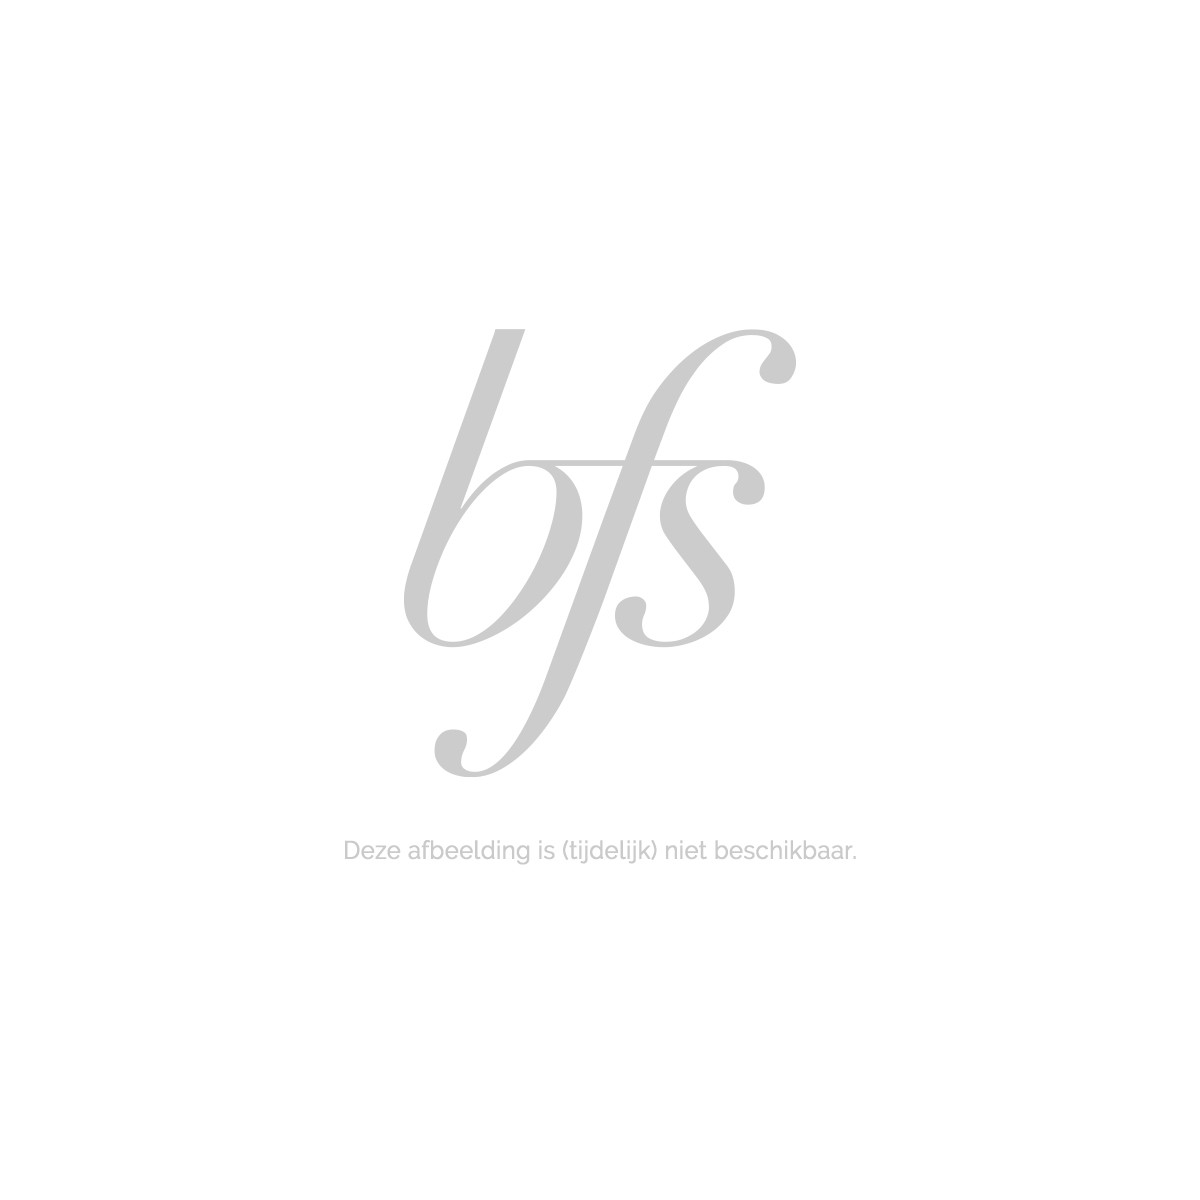 Givenchy Very Irresistible For Women Eau De Toilette Spray 75 Ml